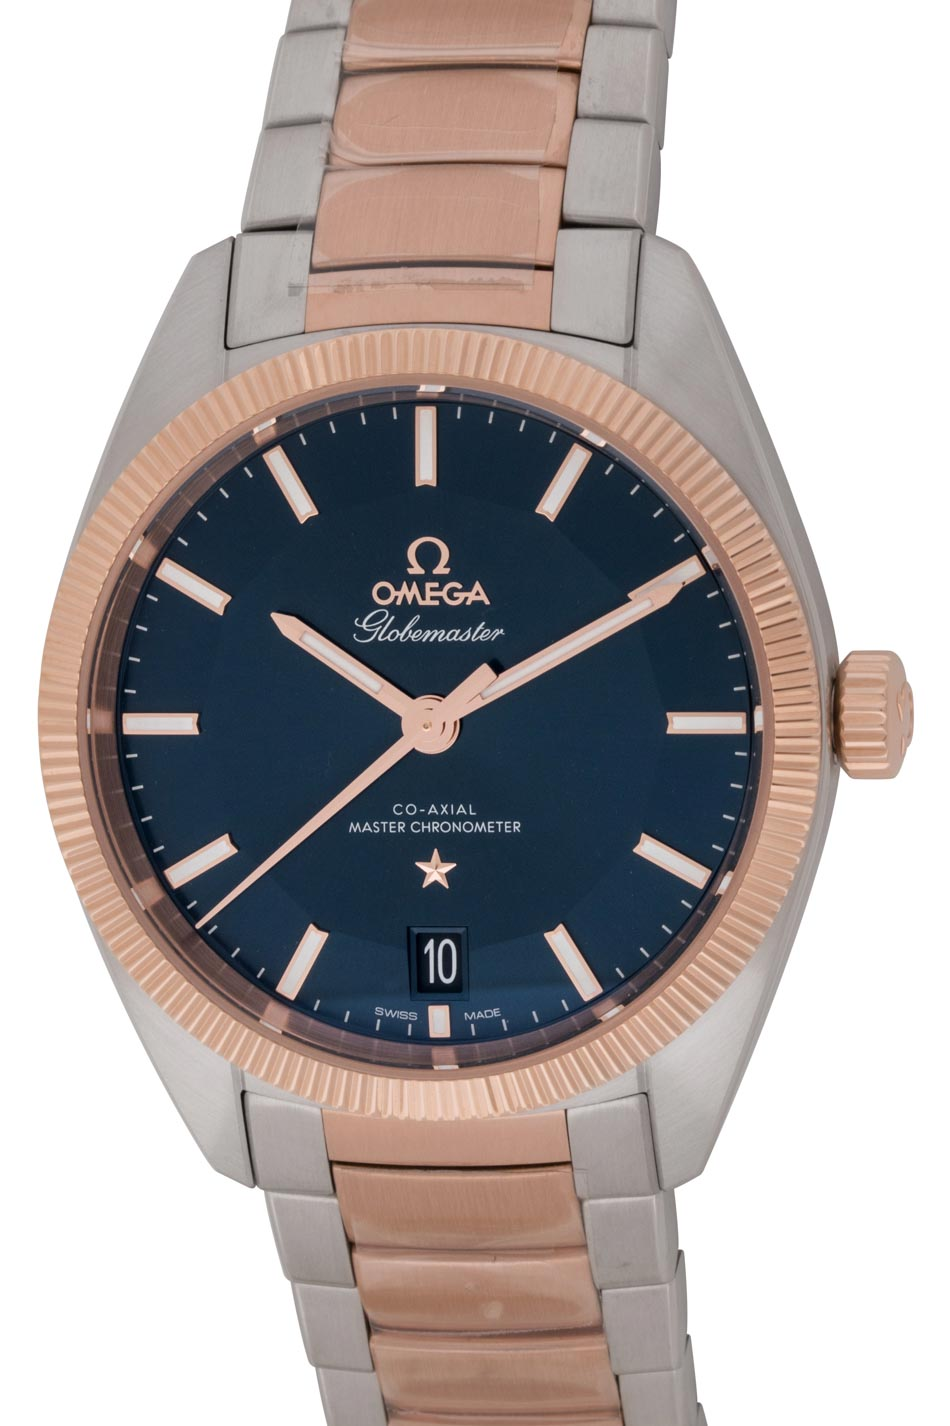 Omega - Globemaster